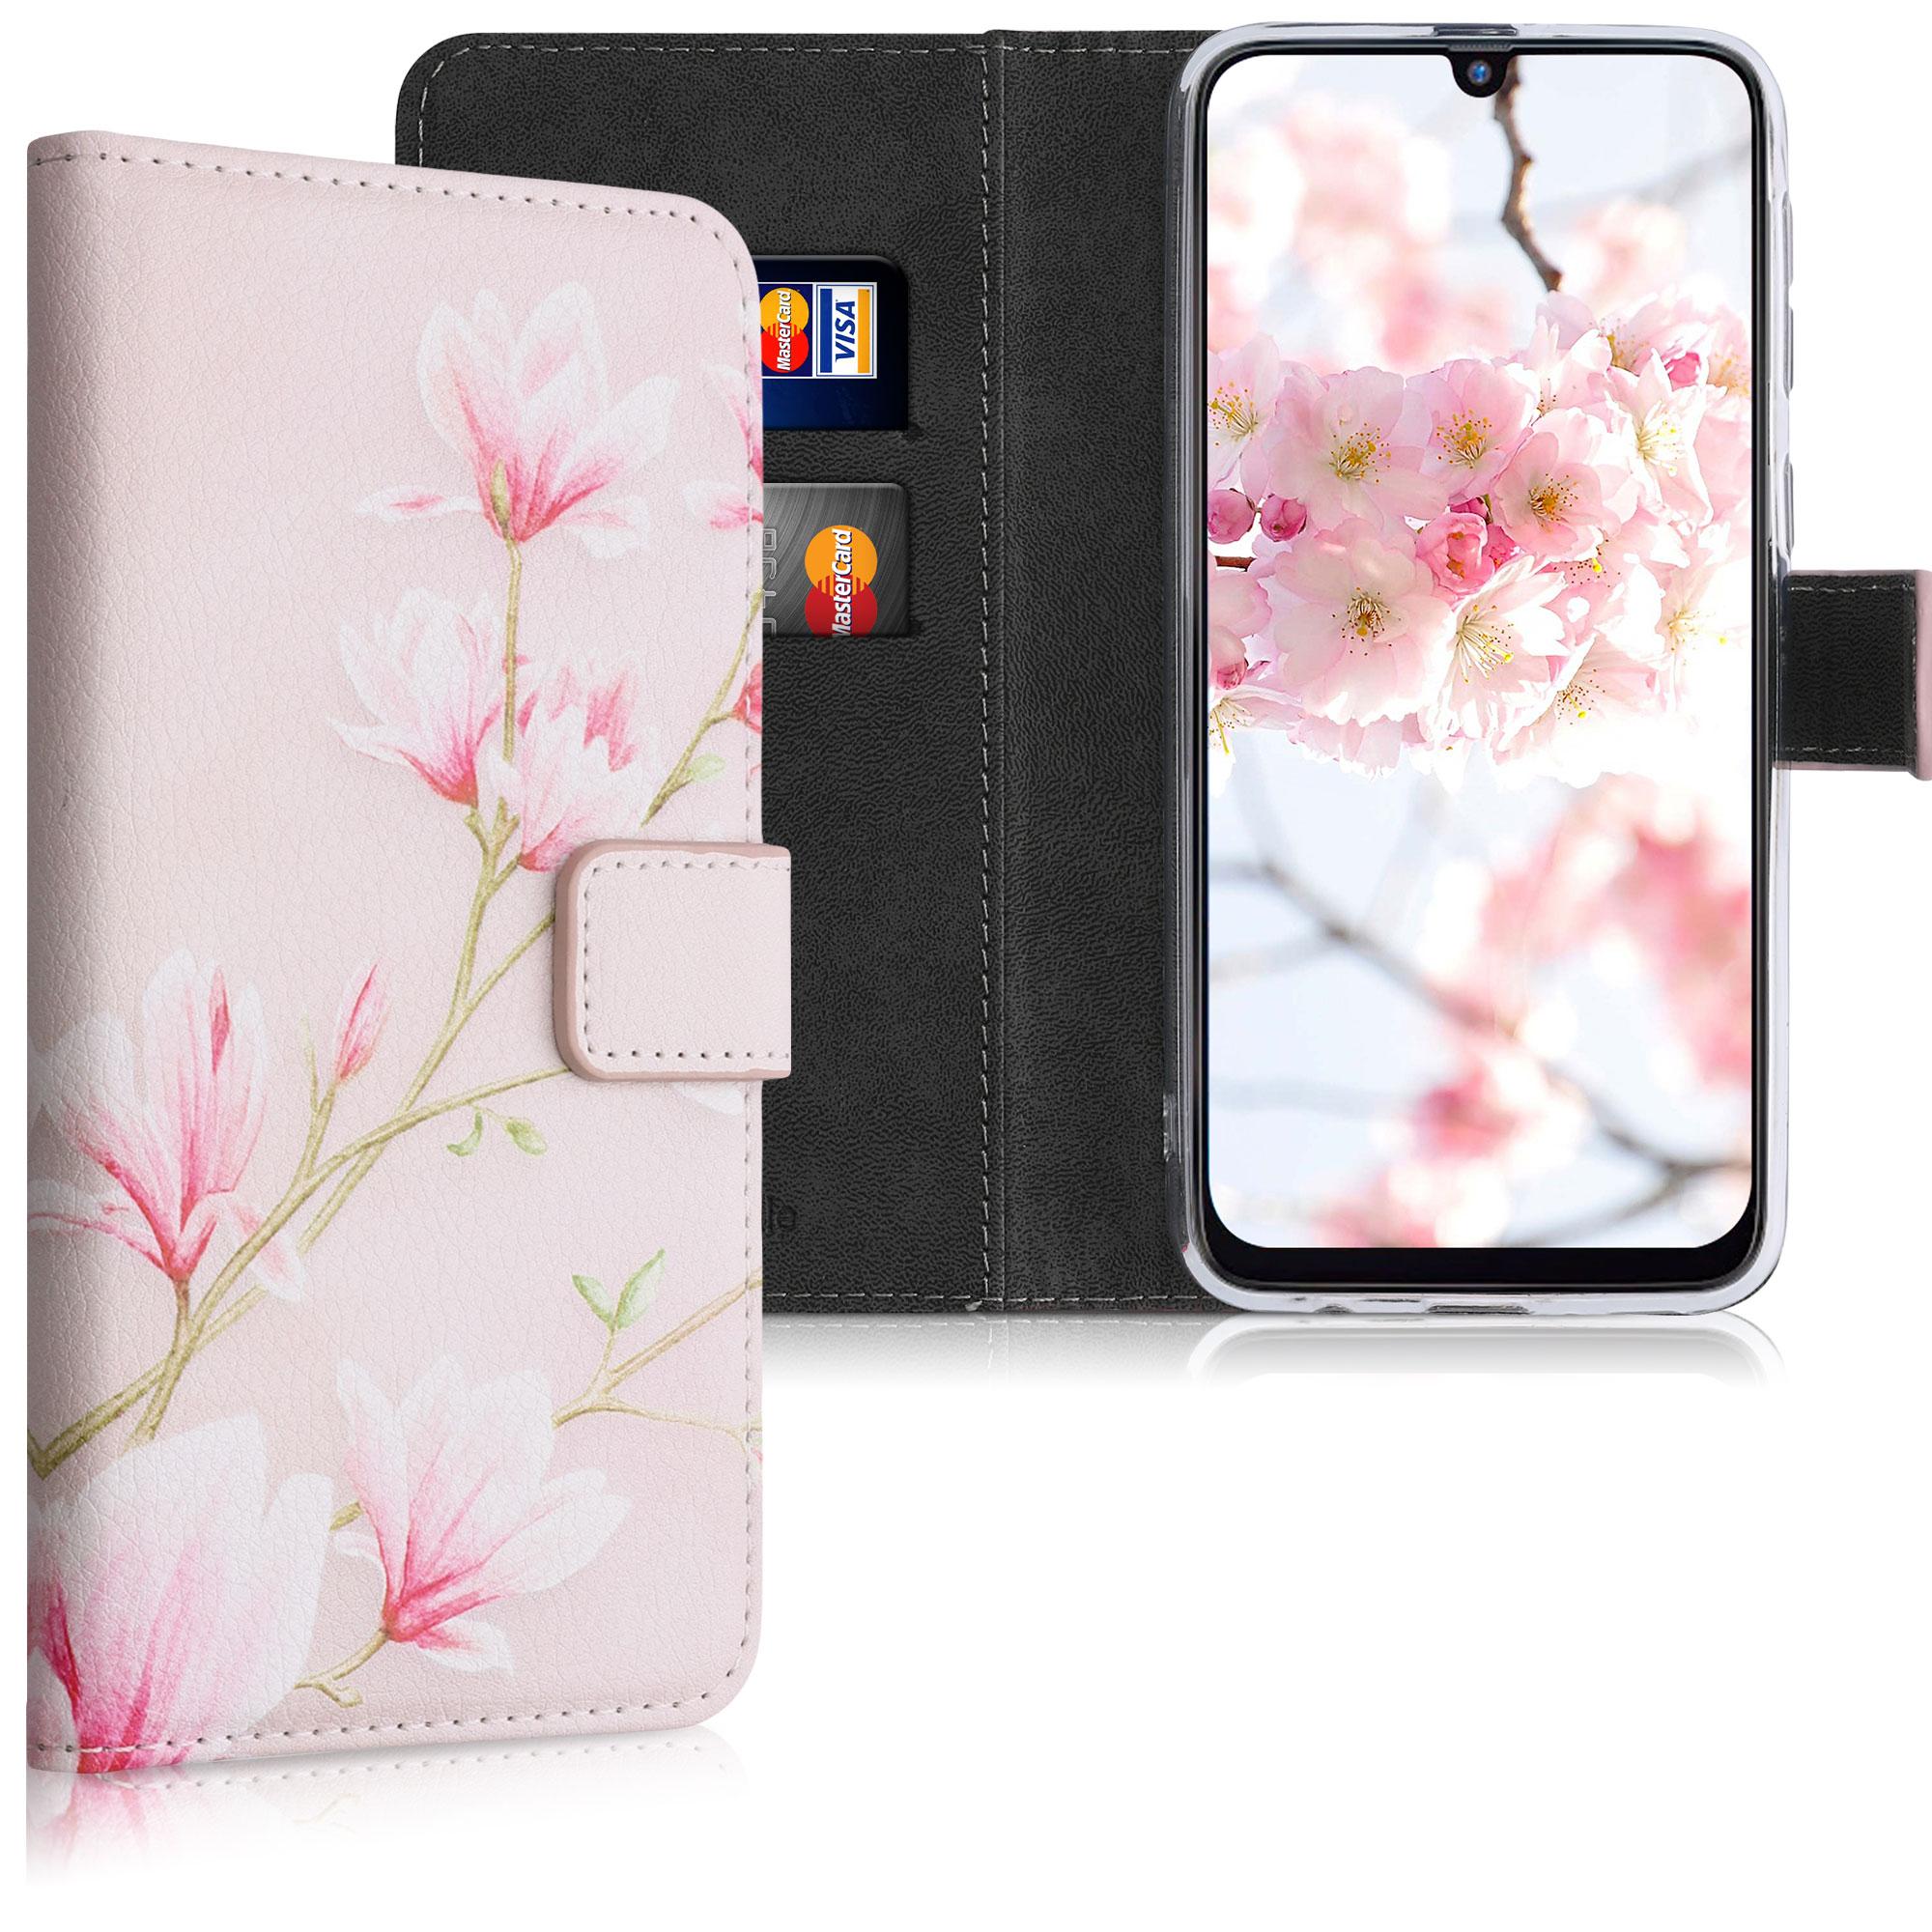 Kožené pouzdro pro Samsung M21 - Magnolie Pink / White / Pink Dusty